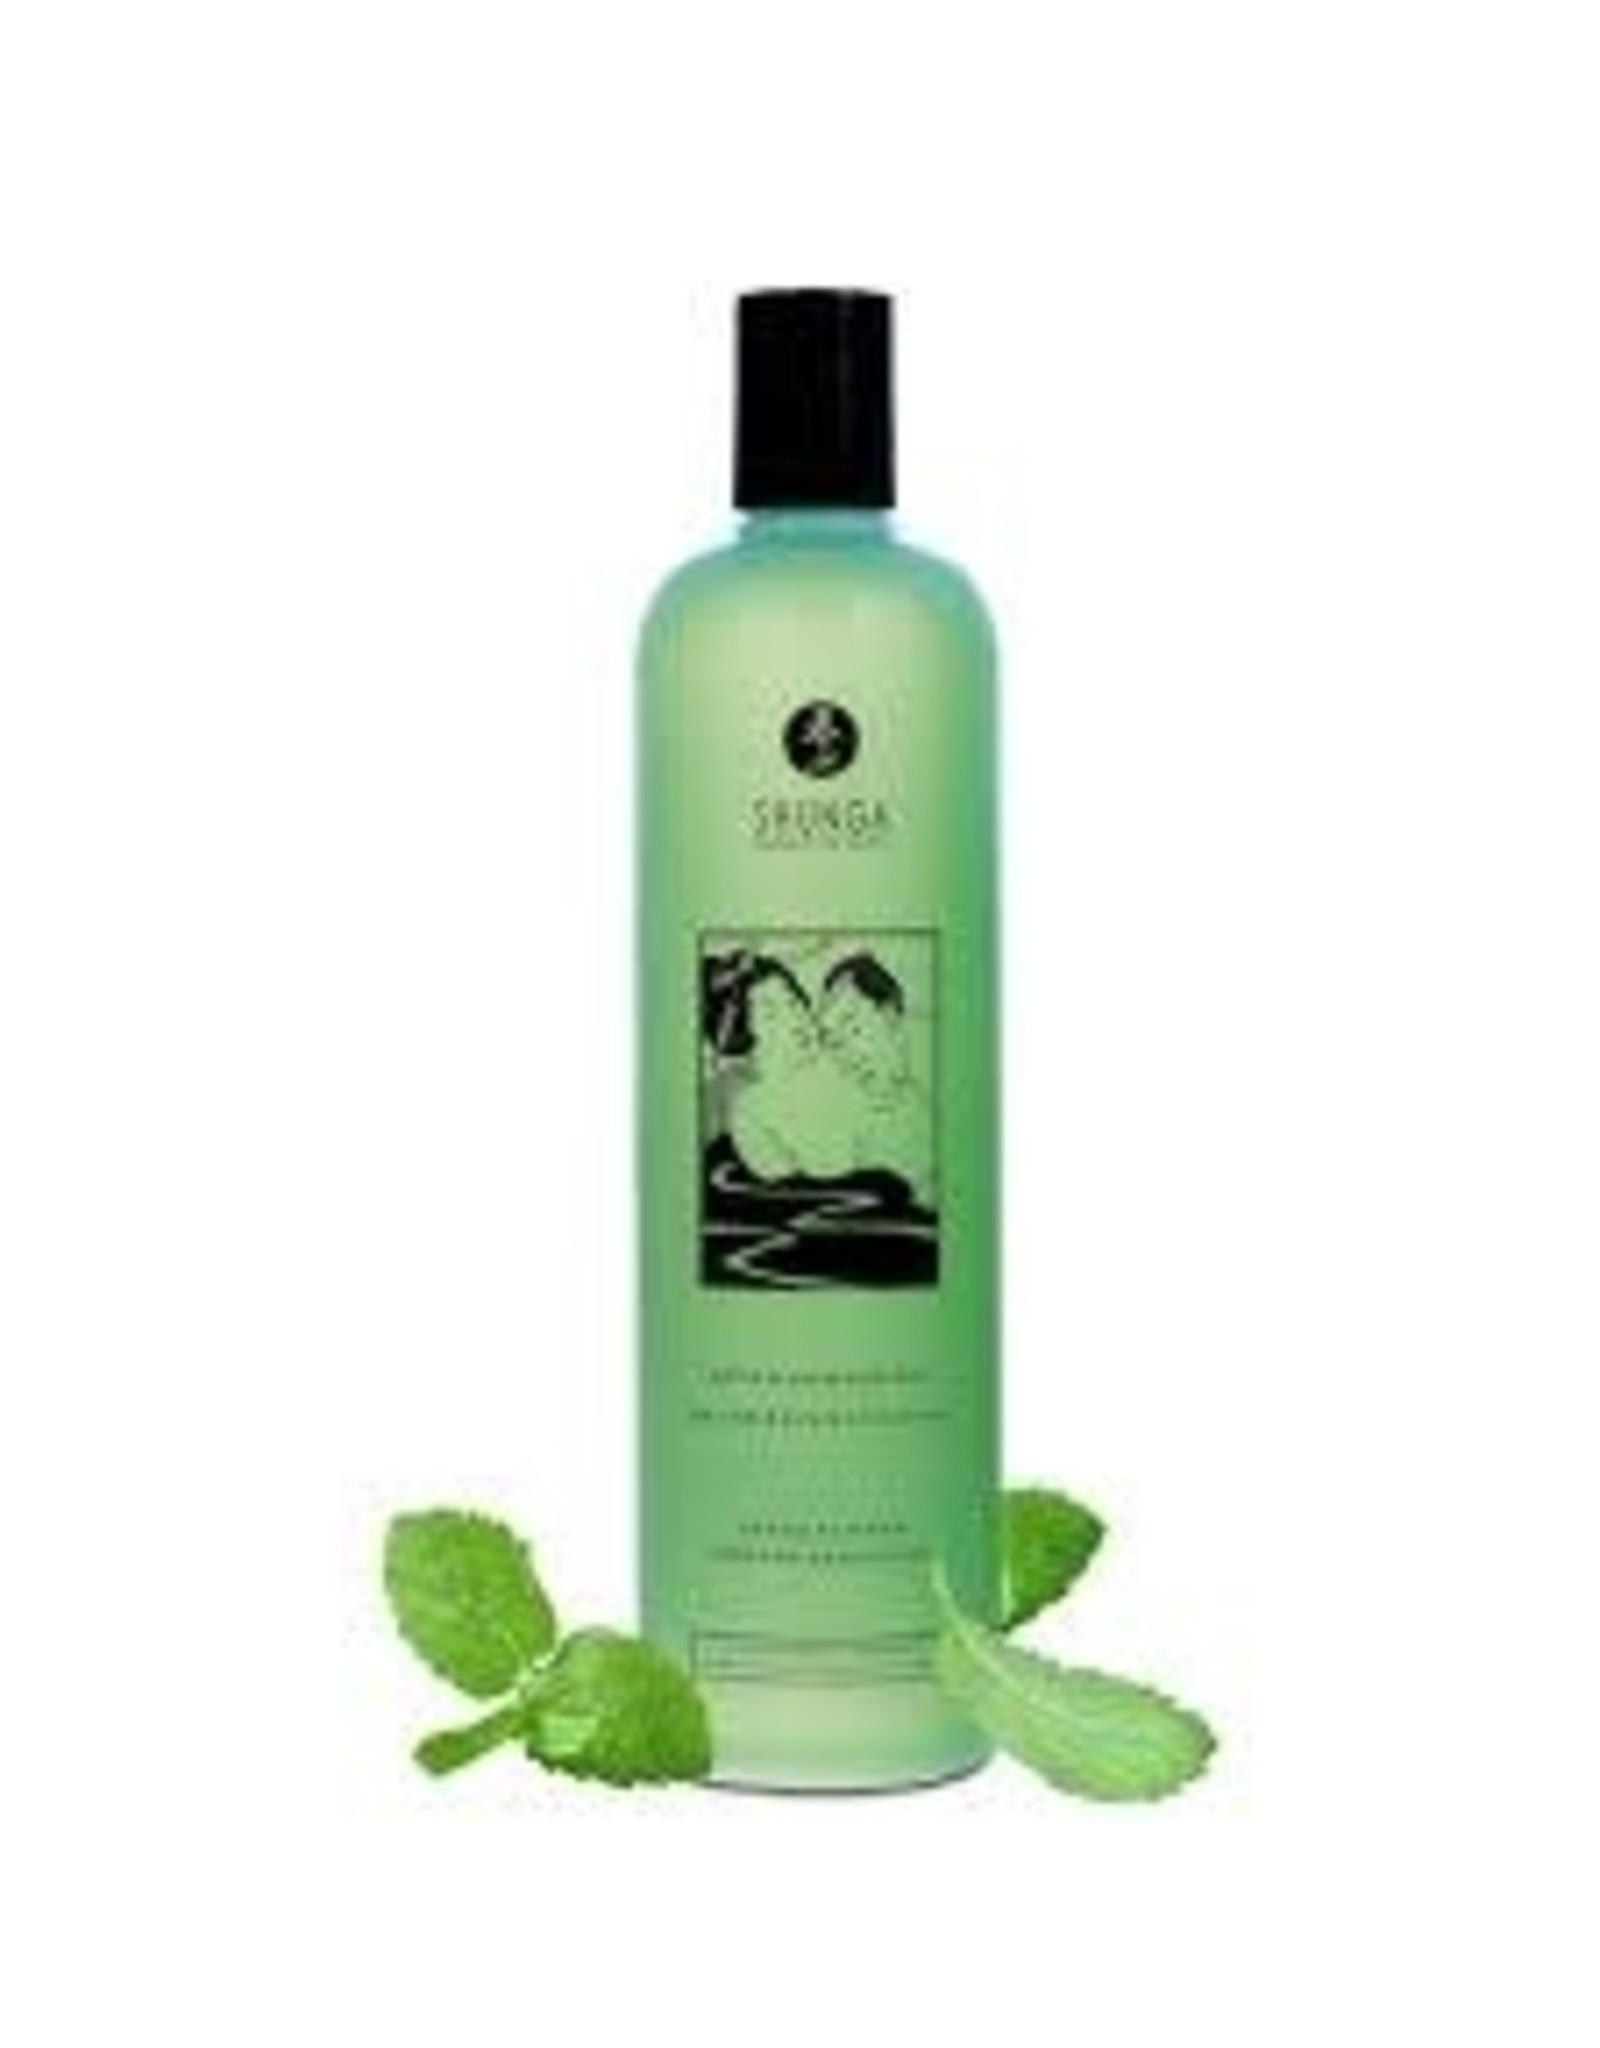 Shunga Shunga - Bath & Shower Gel - Sensual Mint